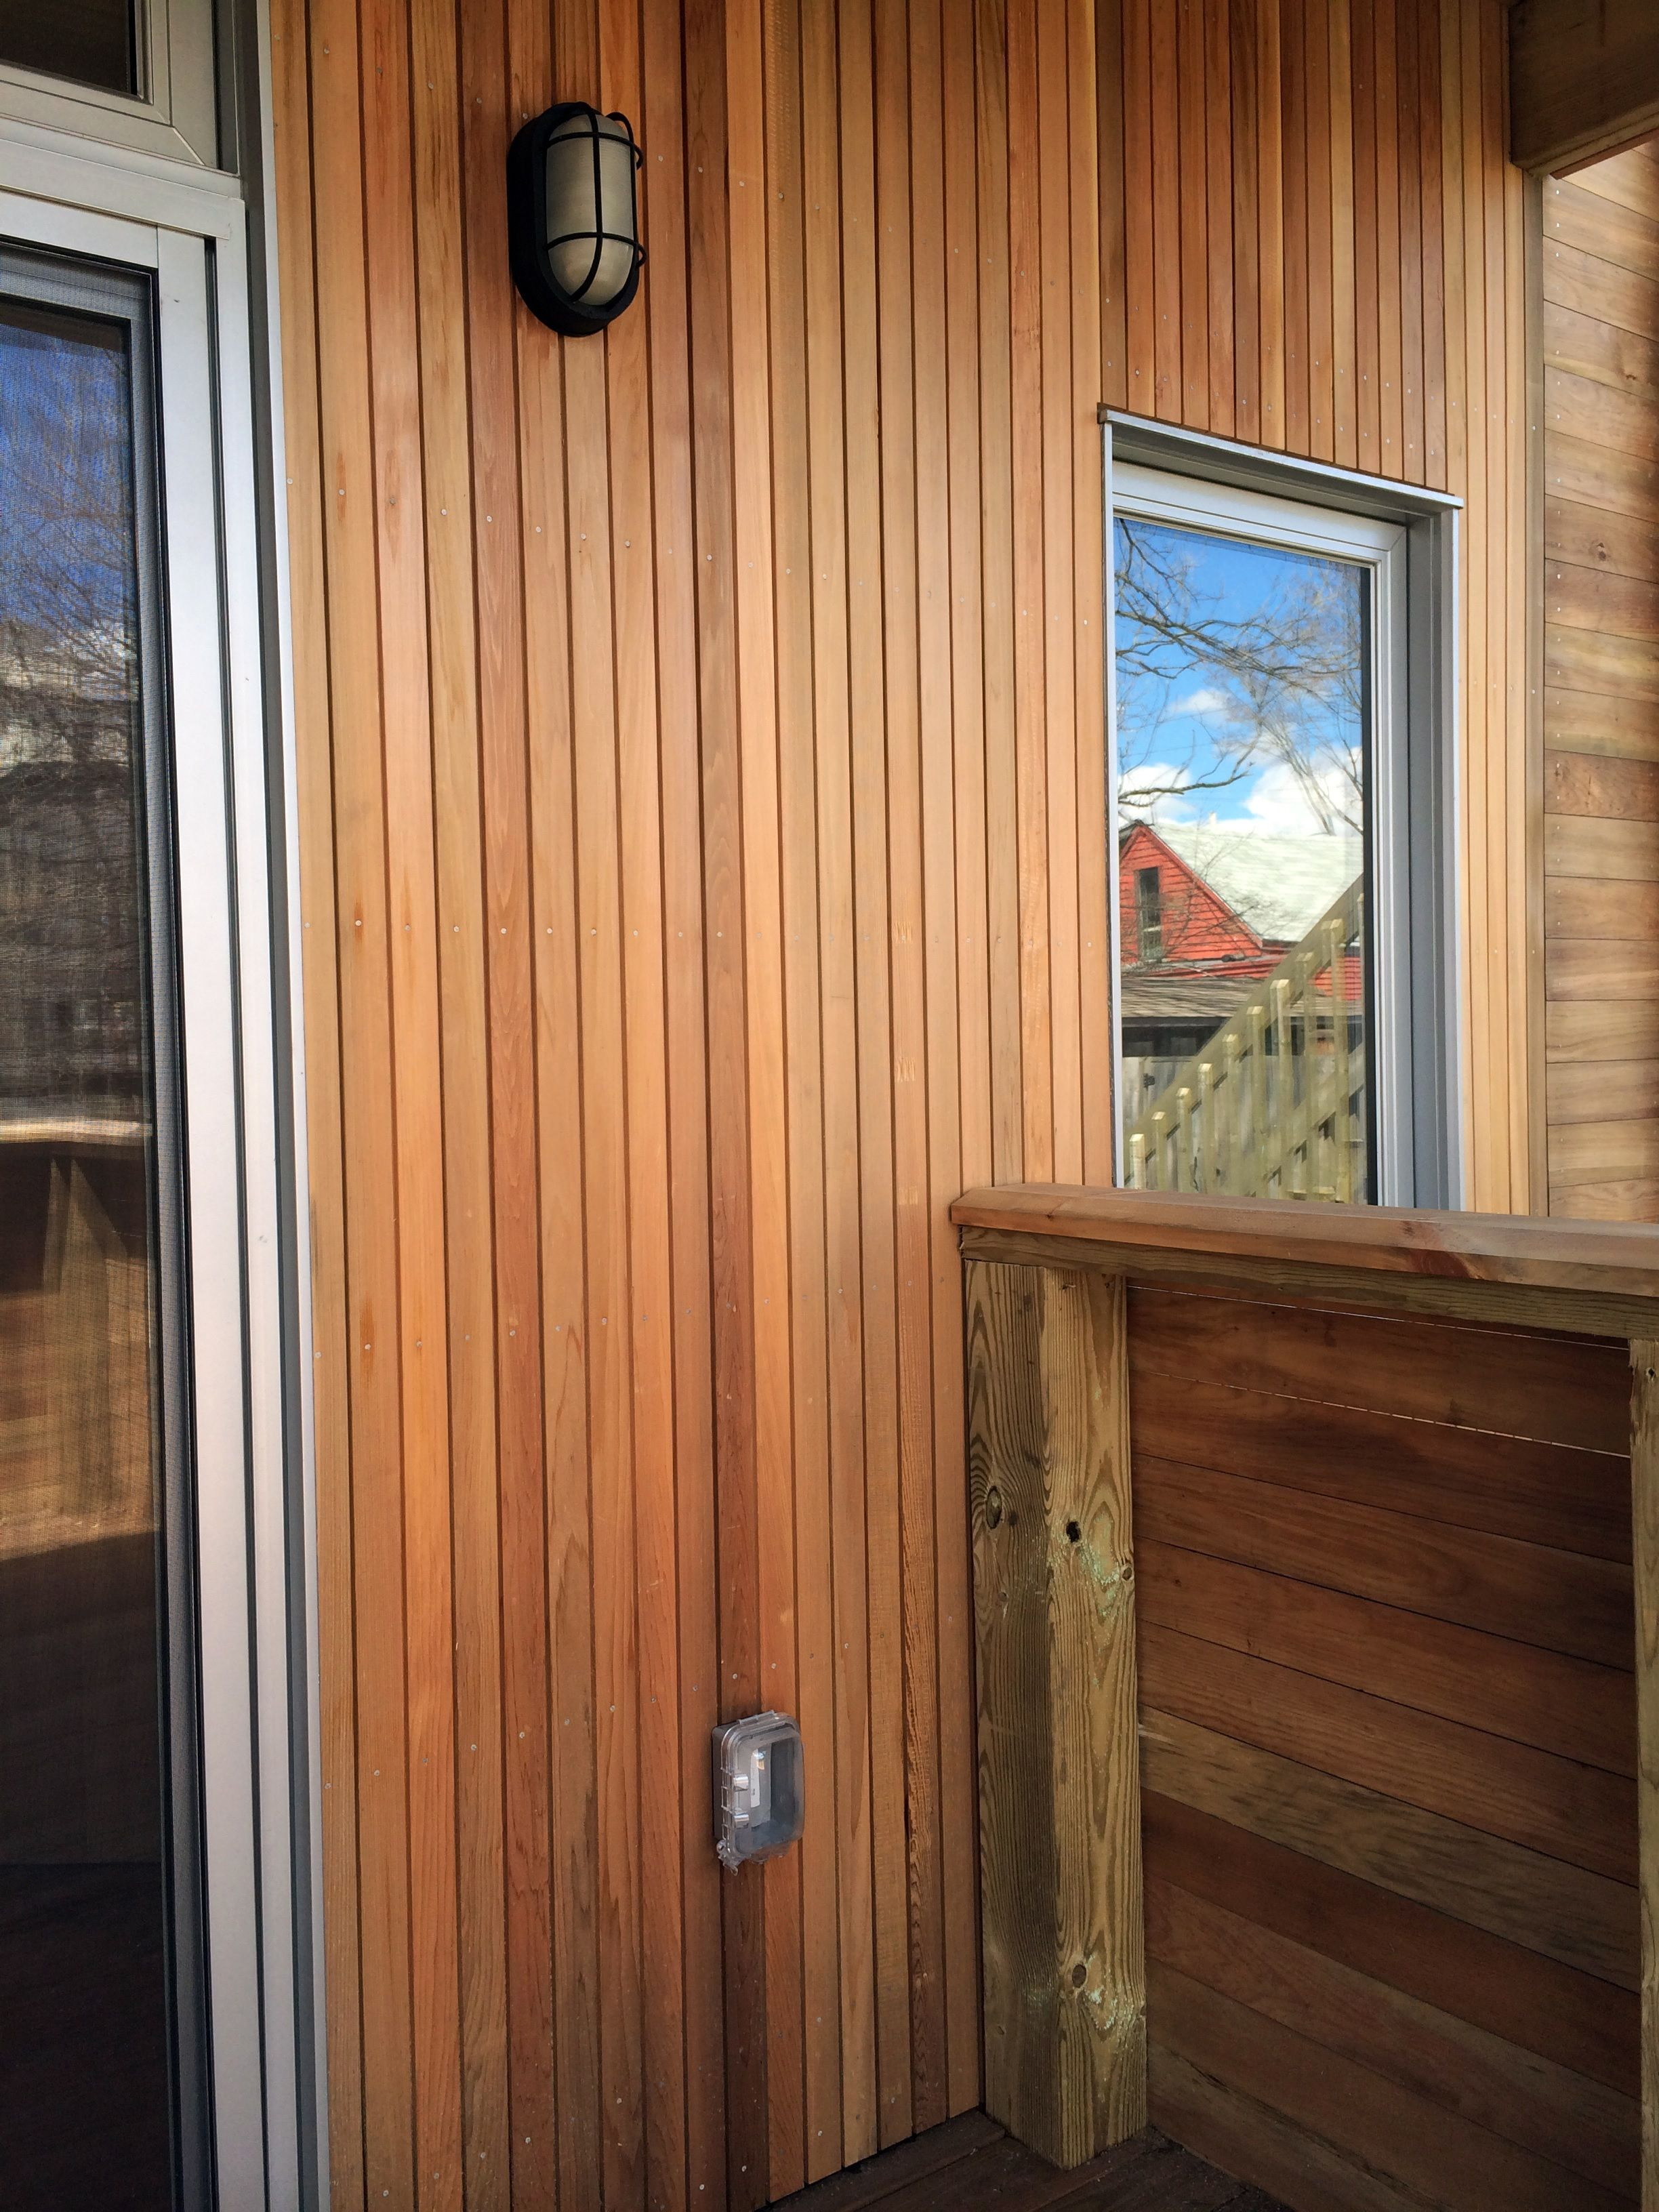 Surprising Shiplap Siding For Your Exterior Design Ideas Lap Cedar Siding Shiplap Wood